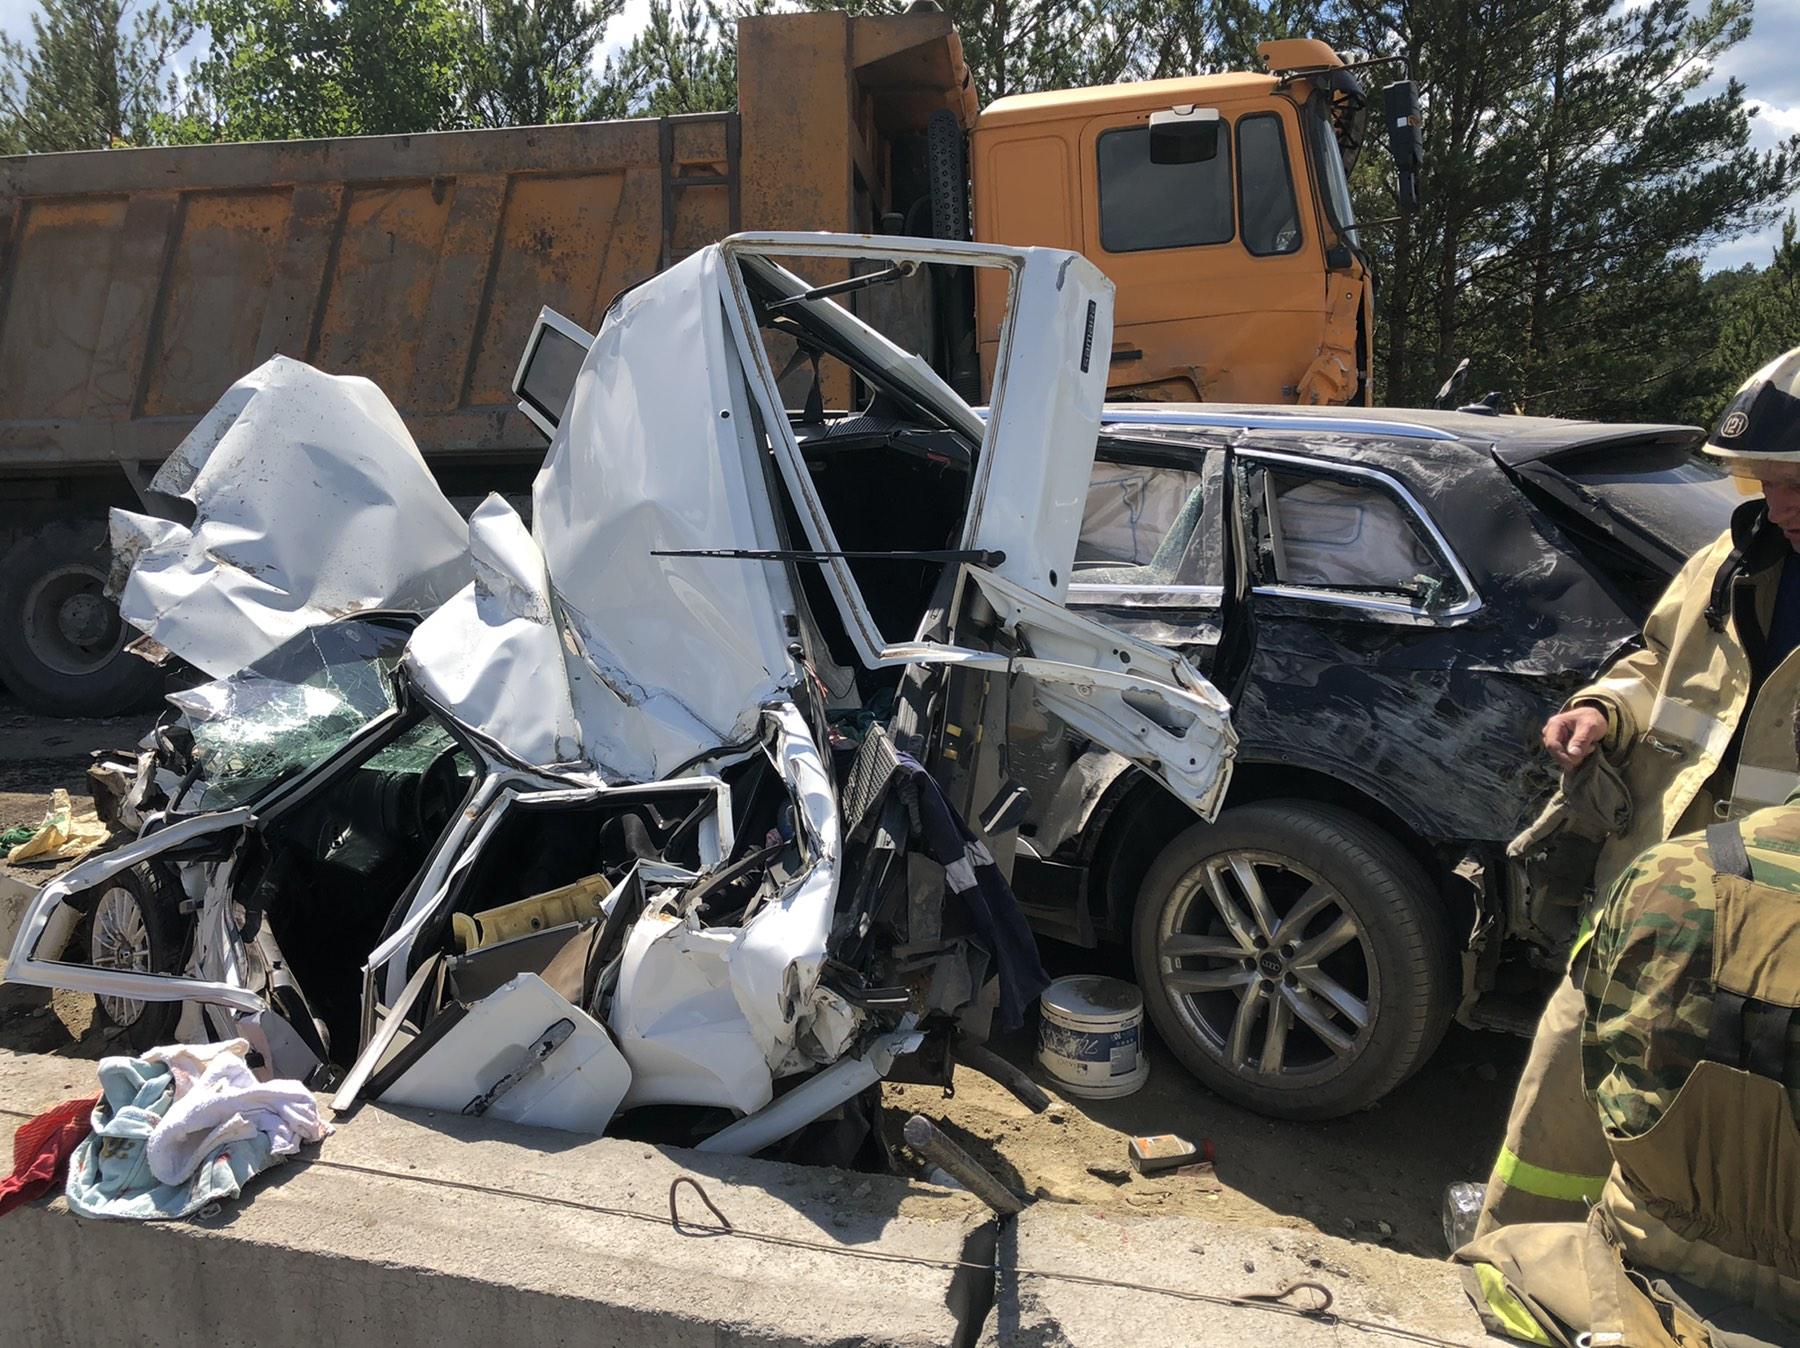 Авария произошла на участке М-5 в Катав-Ивановском районе